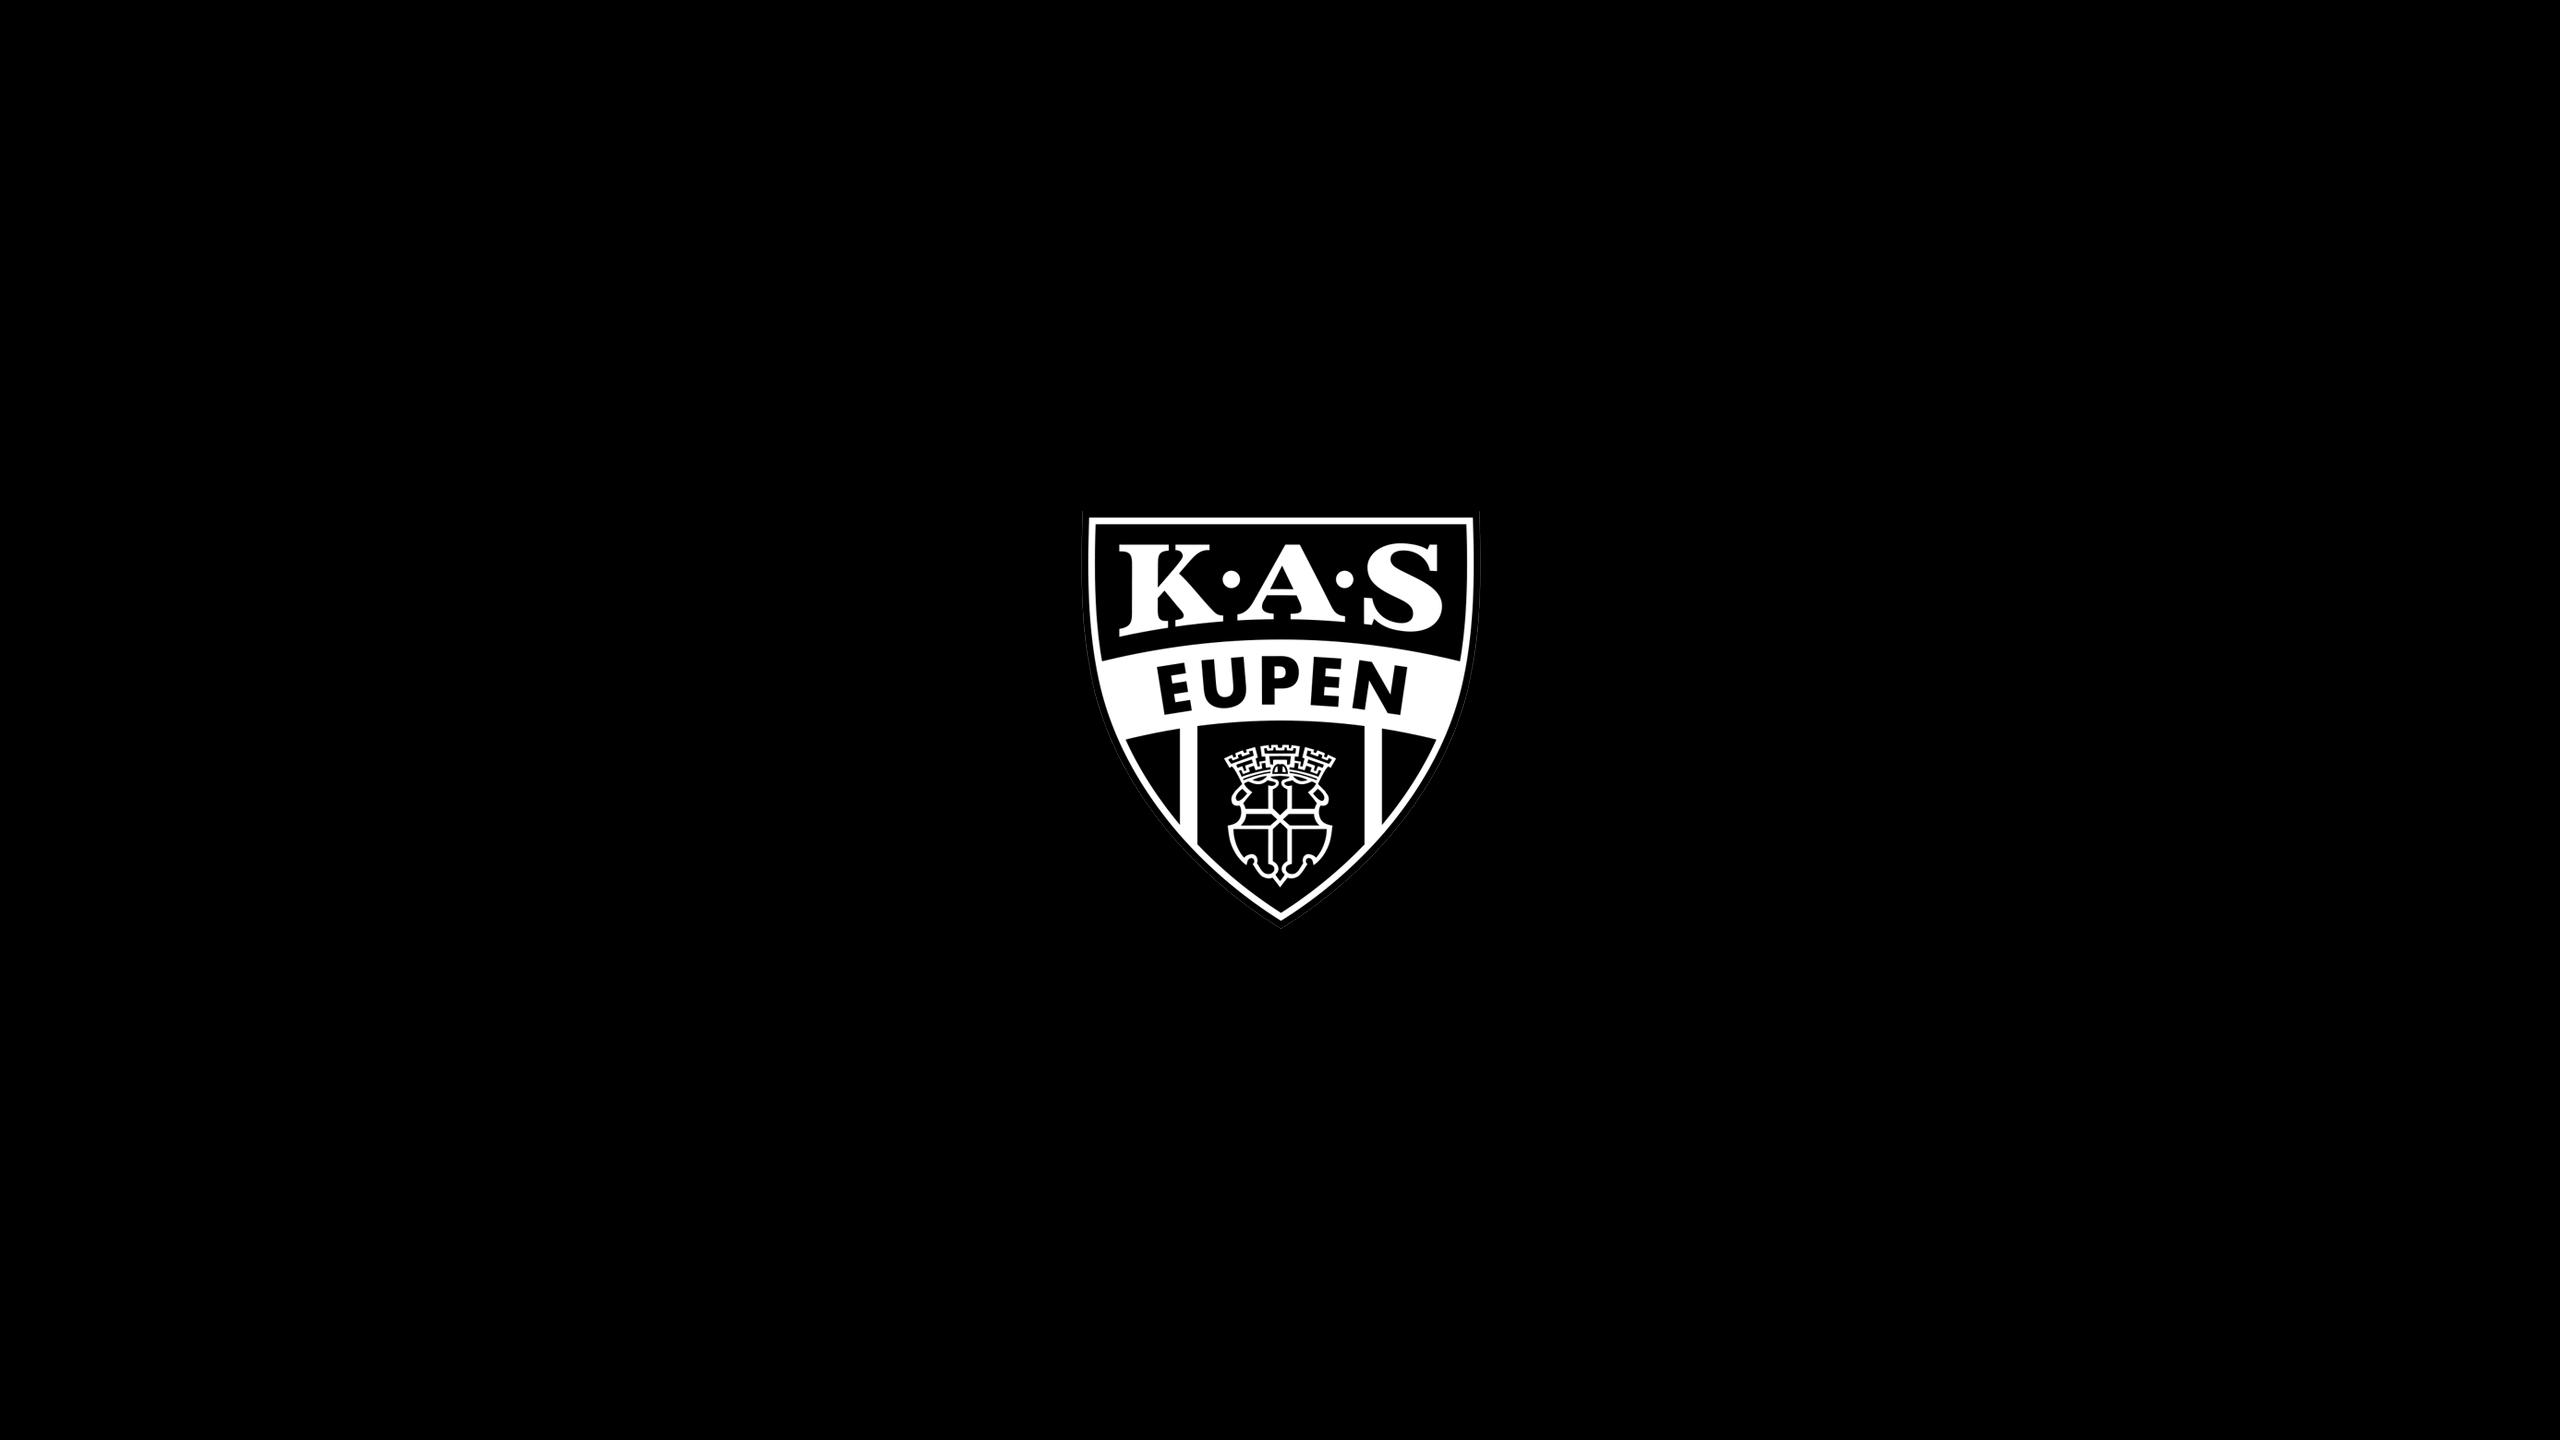 KAS Eupen (Away)